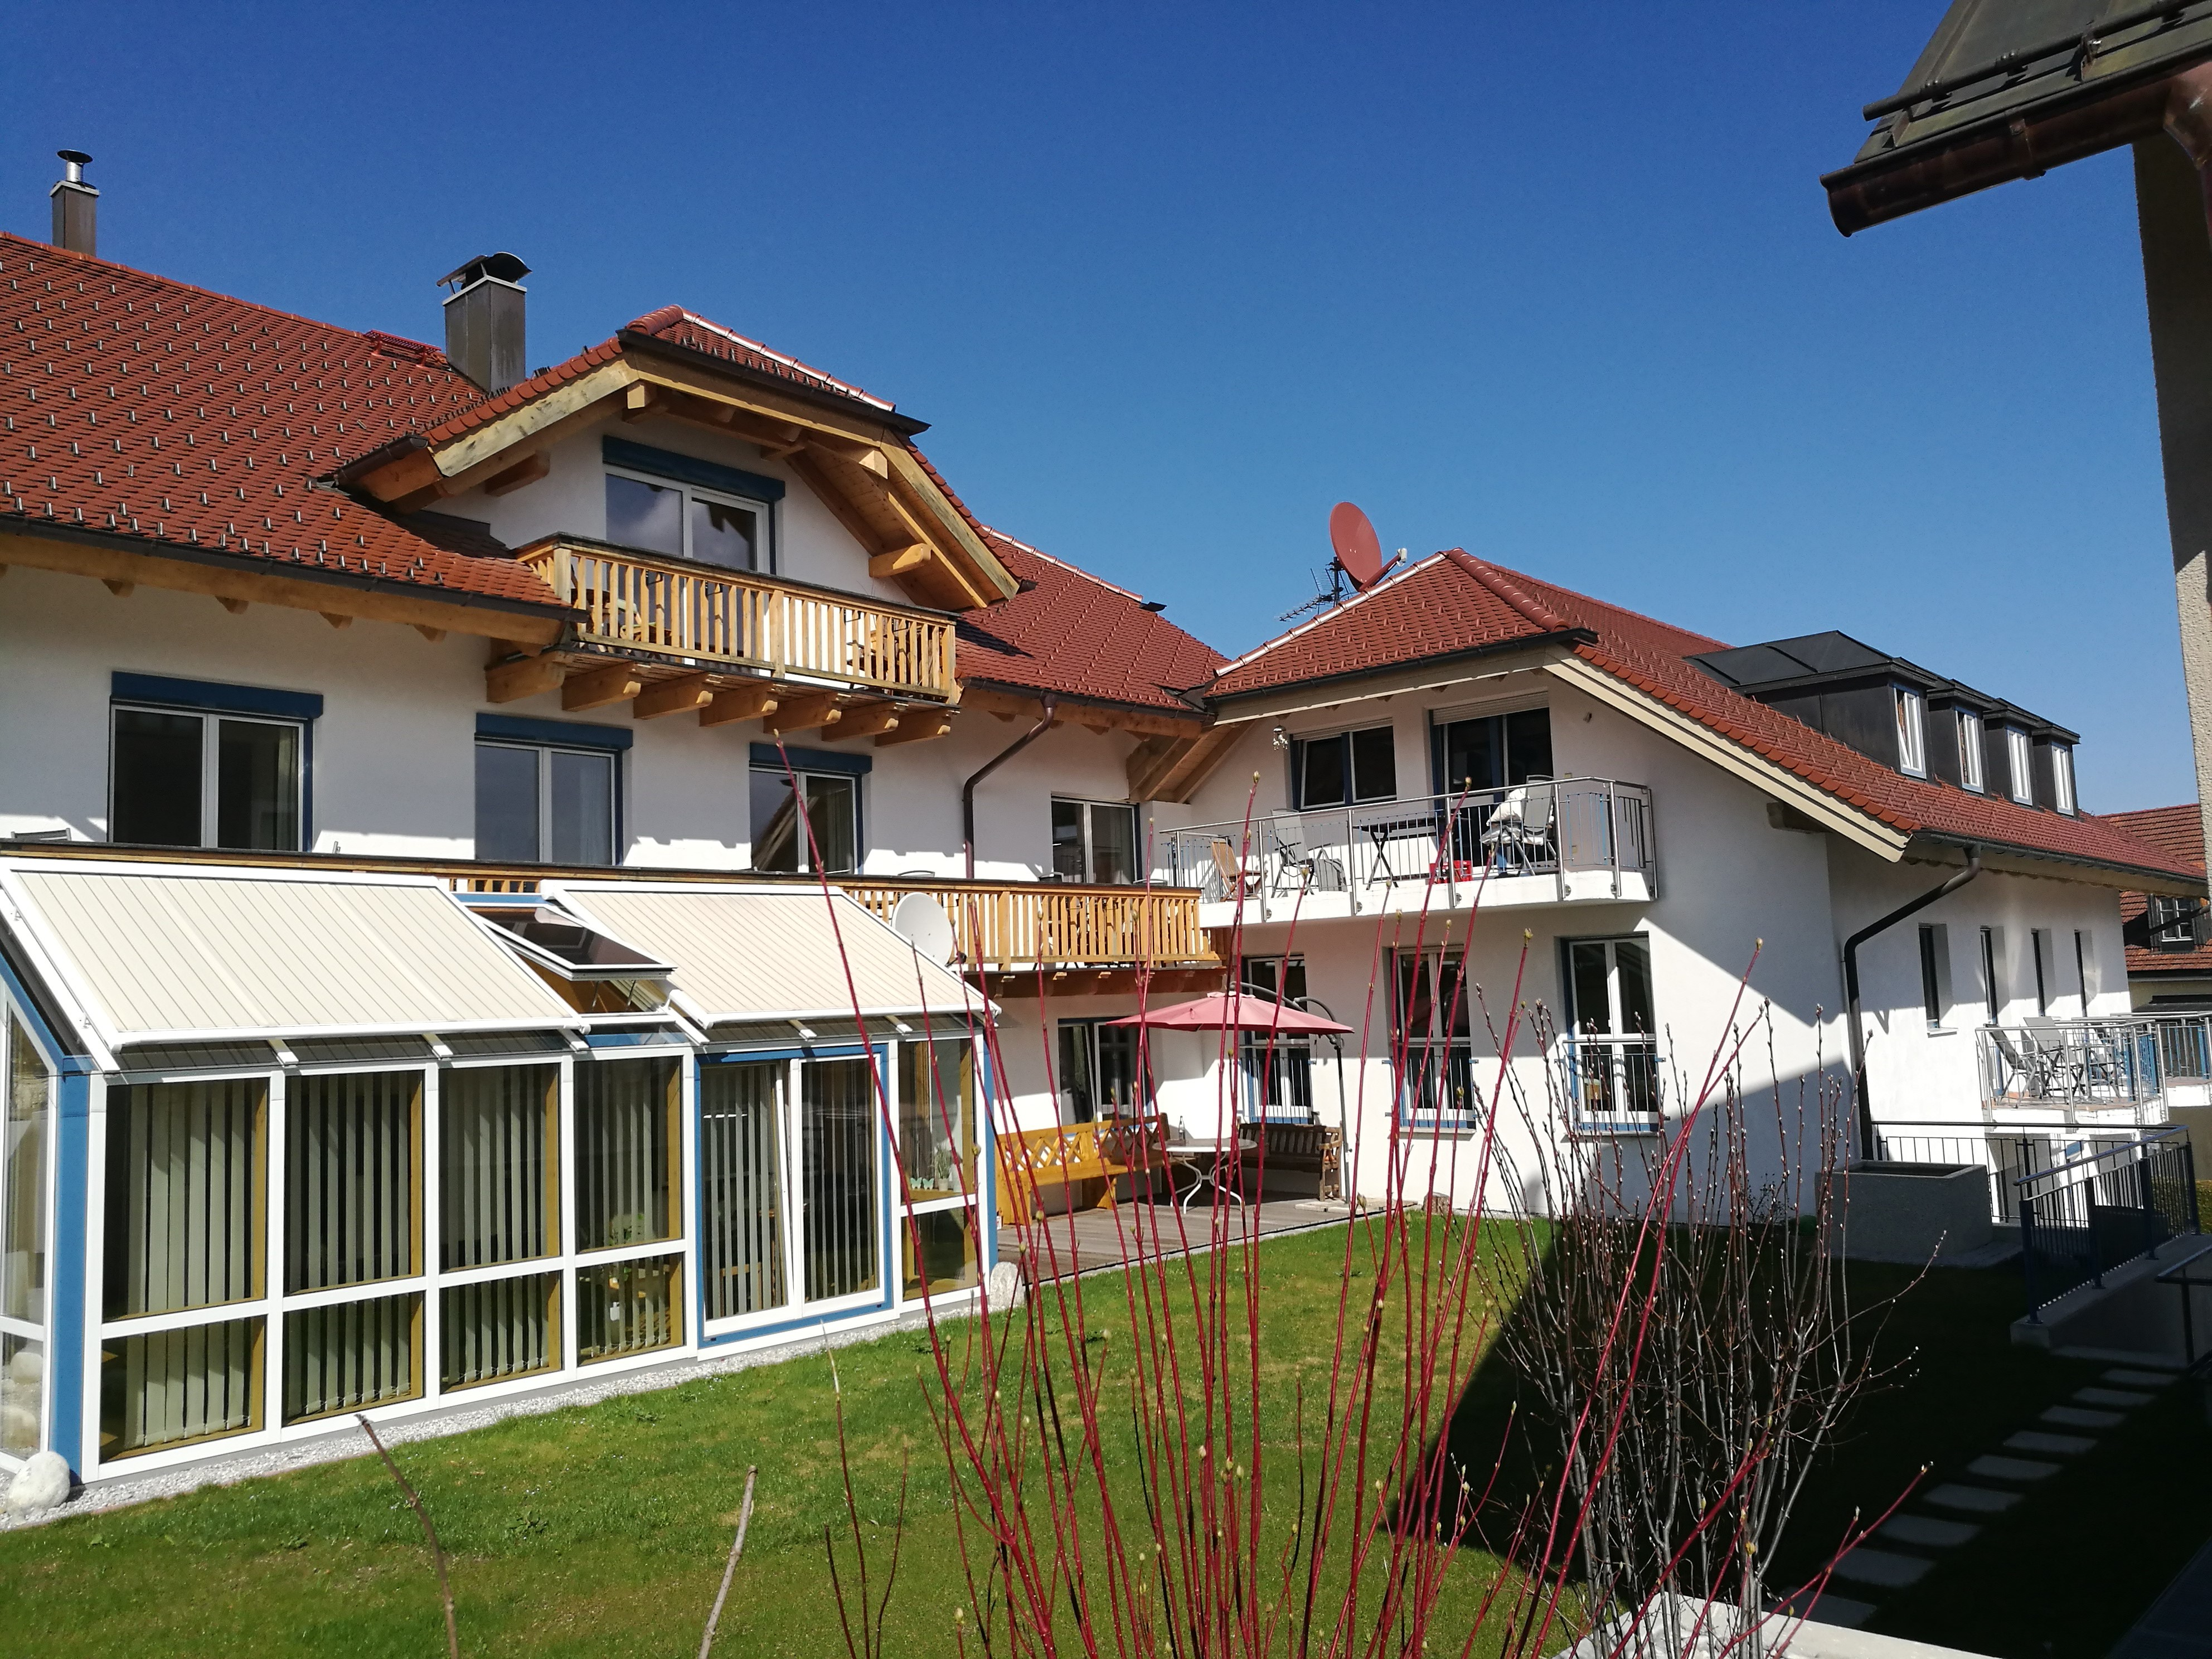 Haus am Gries in Murnau am Staffelsee • HolidayCheck